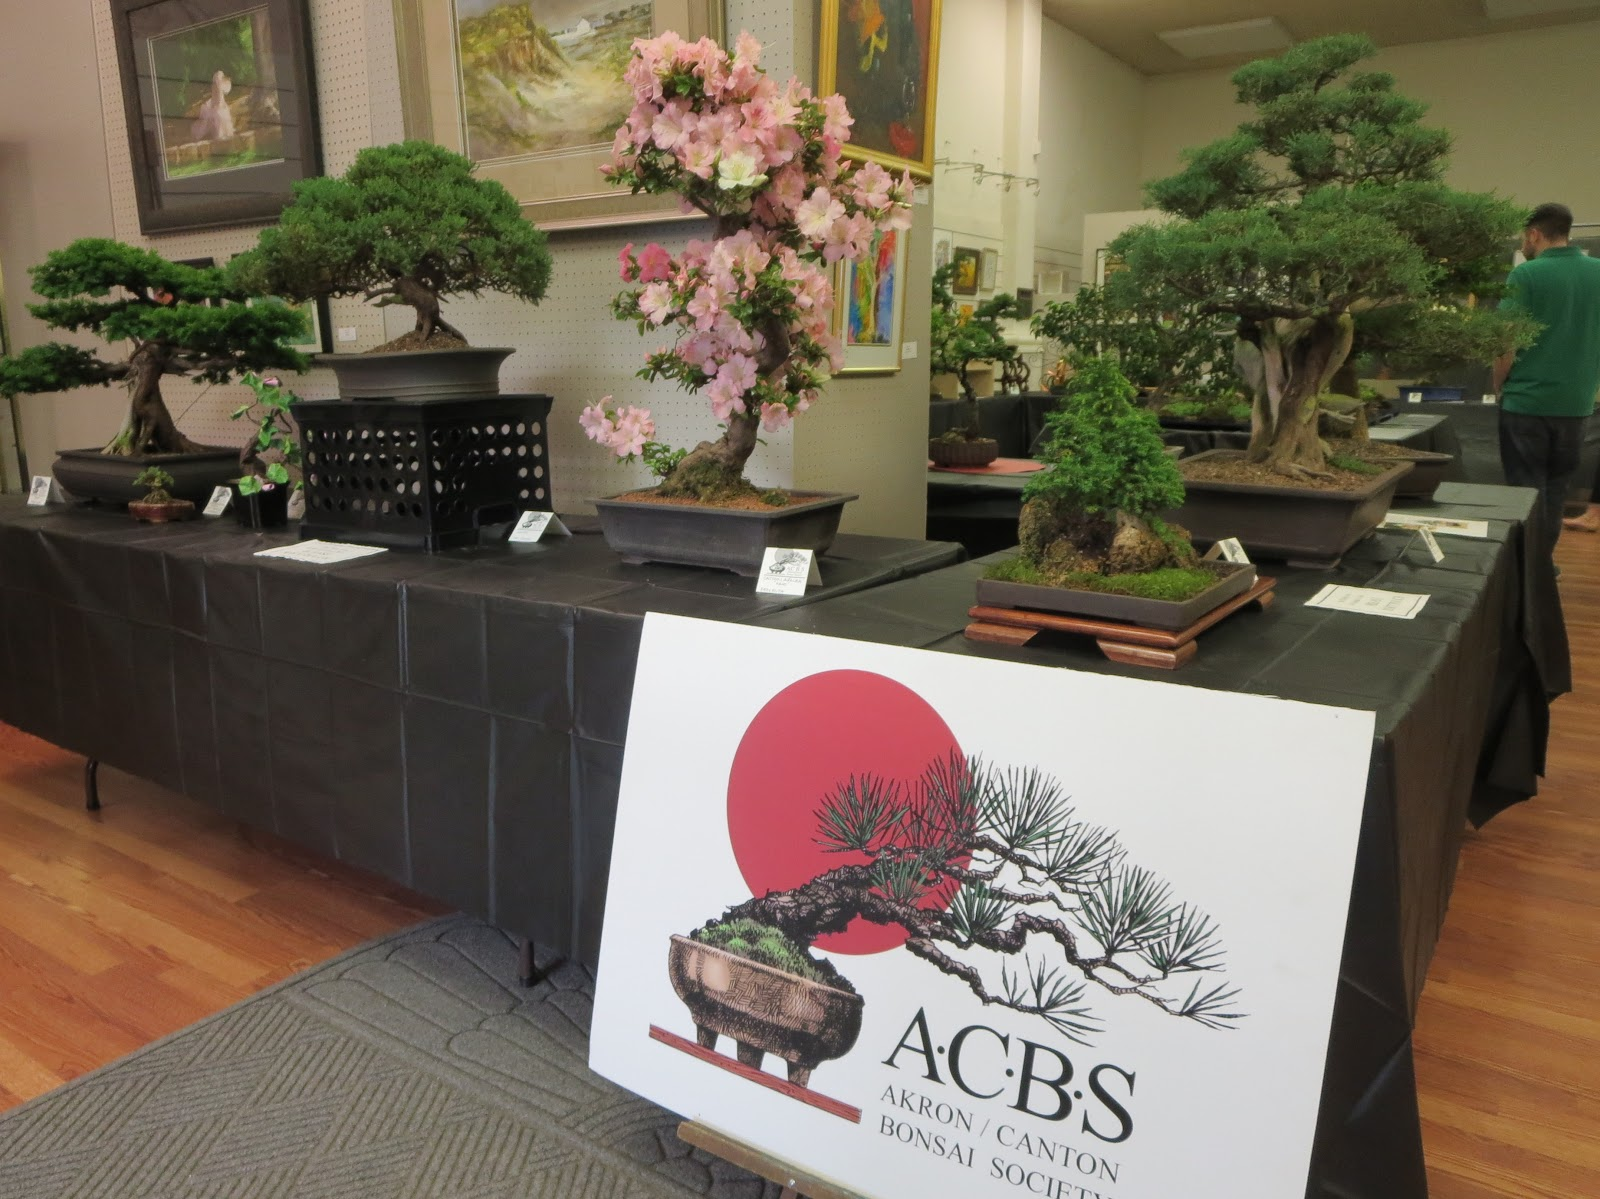 Akron Canton Bonsai Society